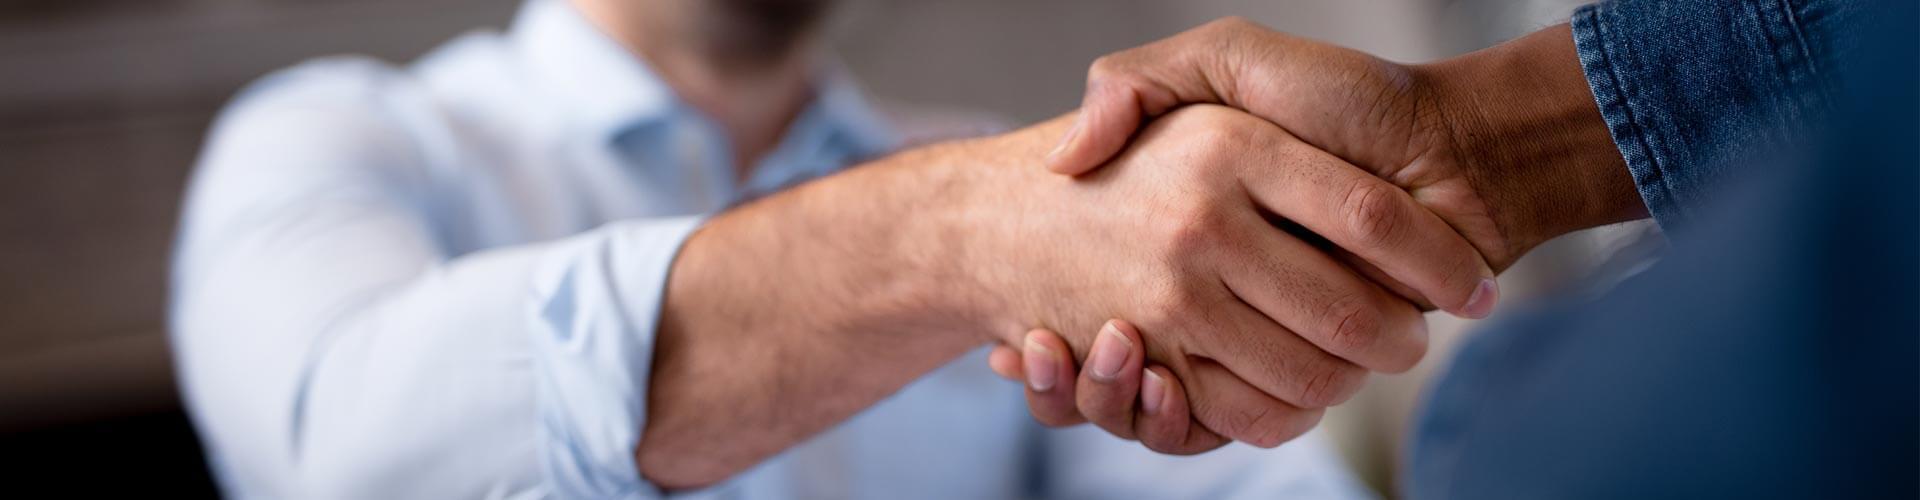 bKV Service Handschlag